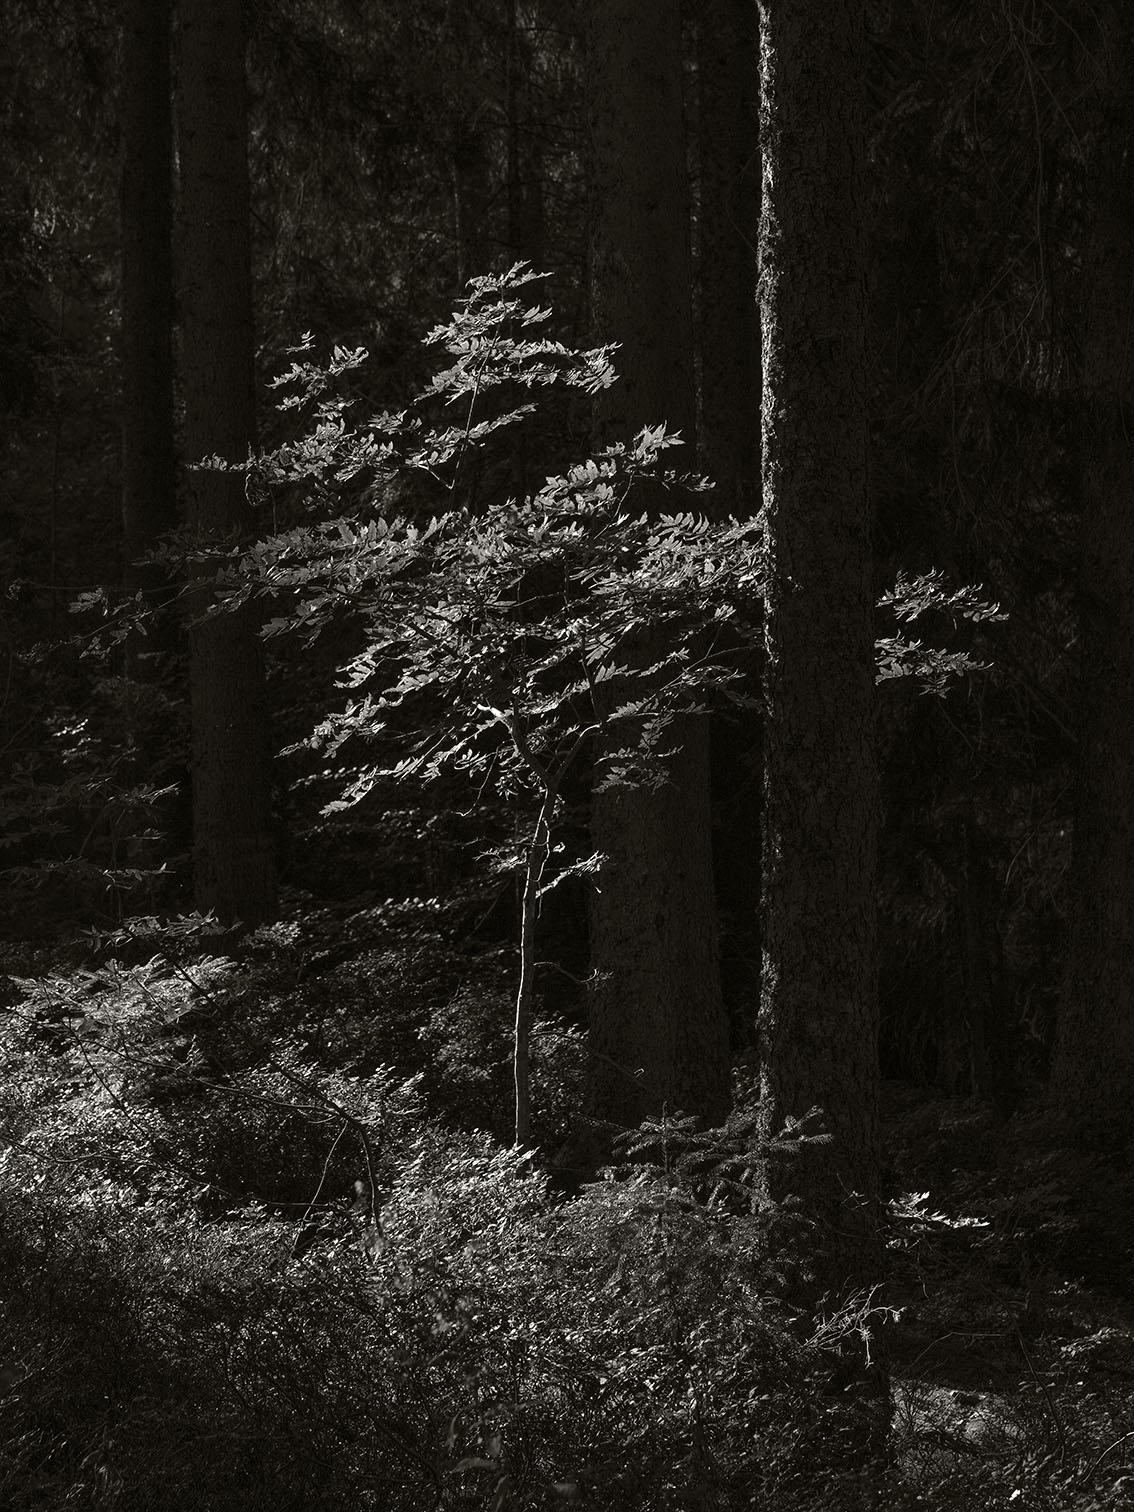 woods around the Windgfällweiher, Germany